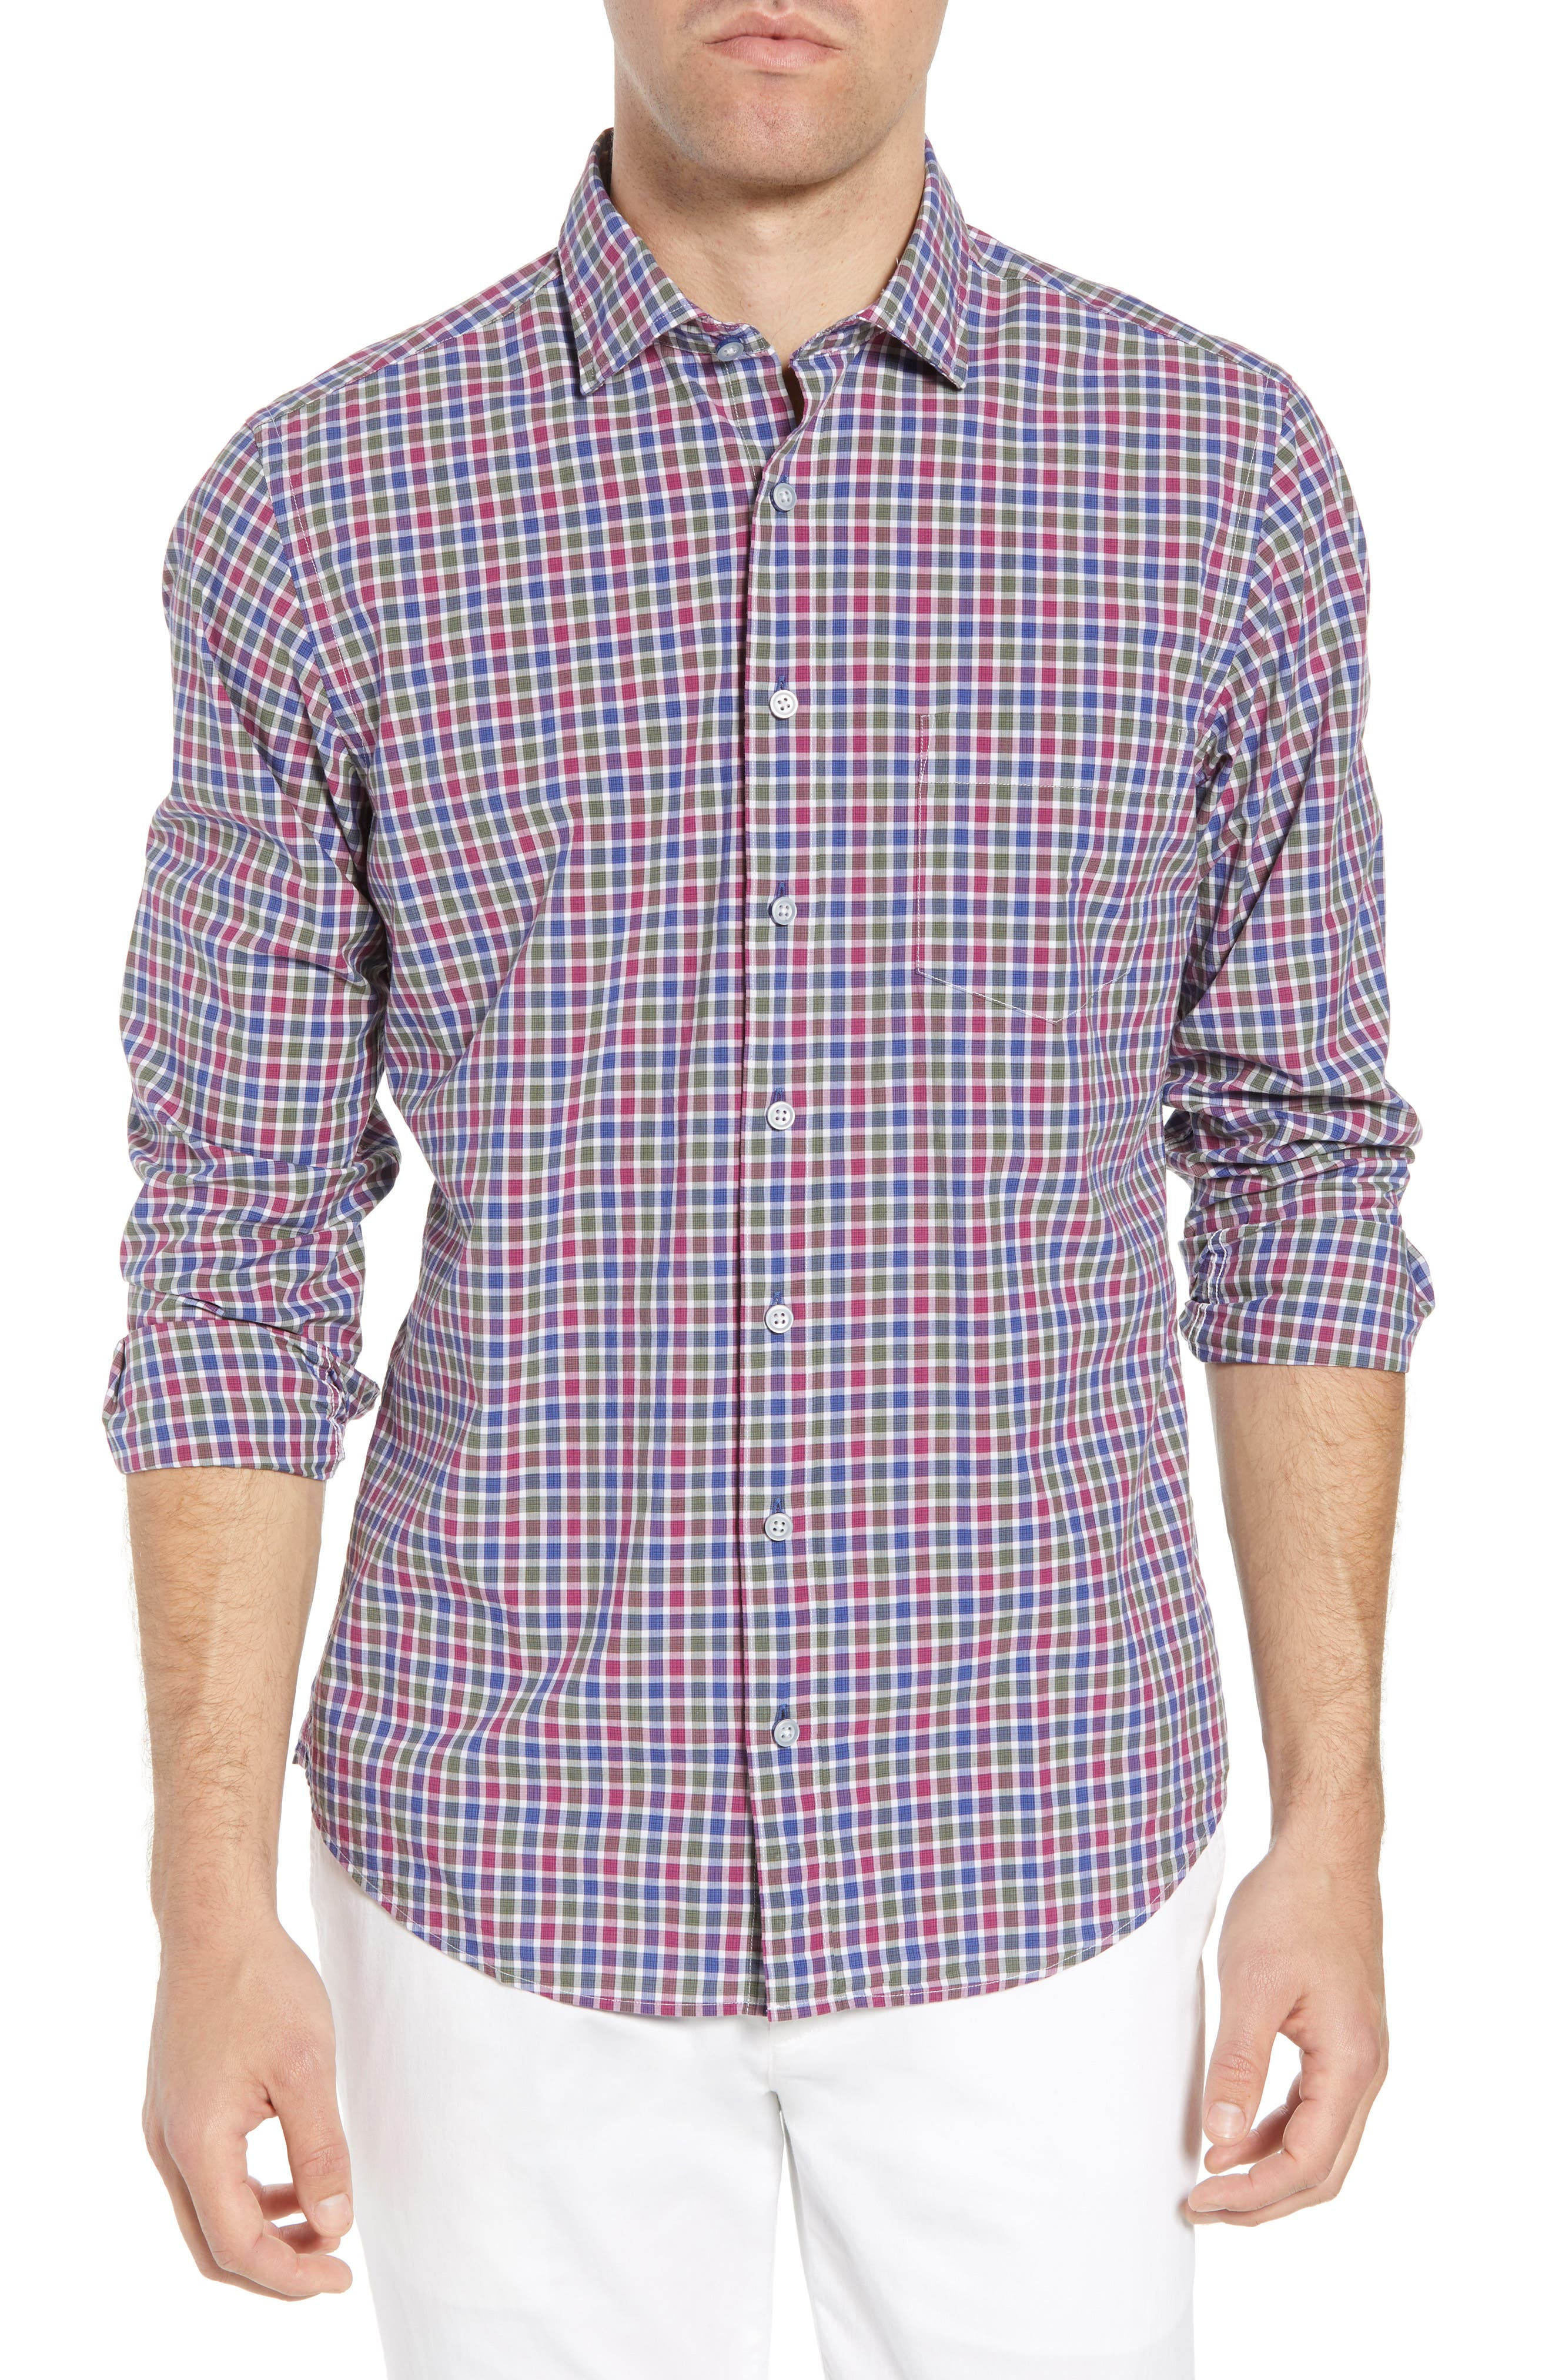 Main Image - Rodd & Gunn Macreas Flat Regular Fit Sport Shirt